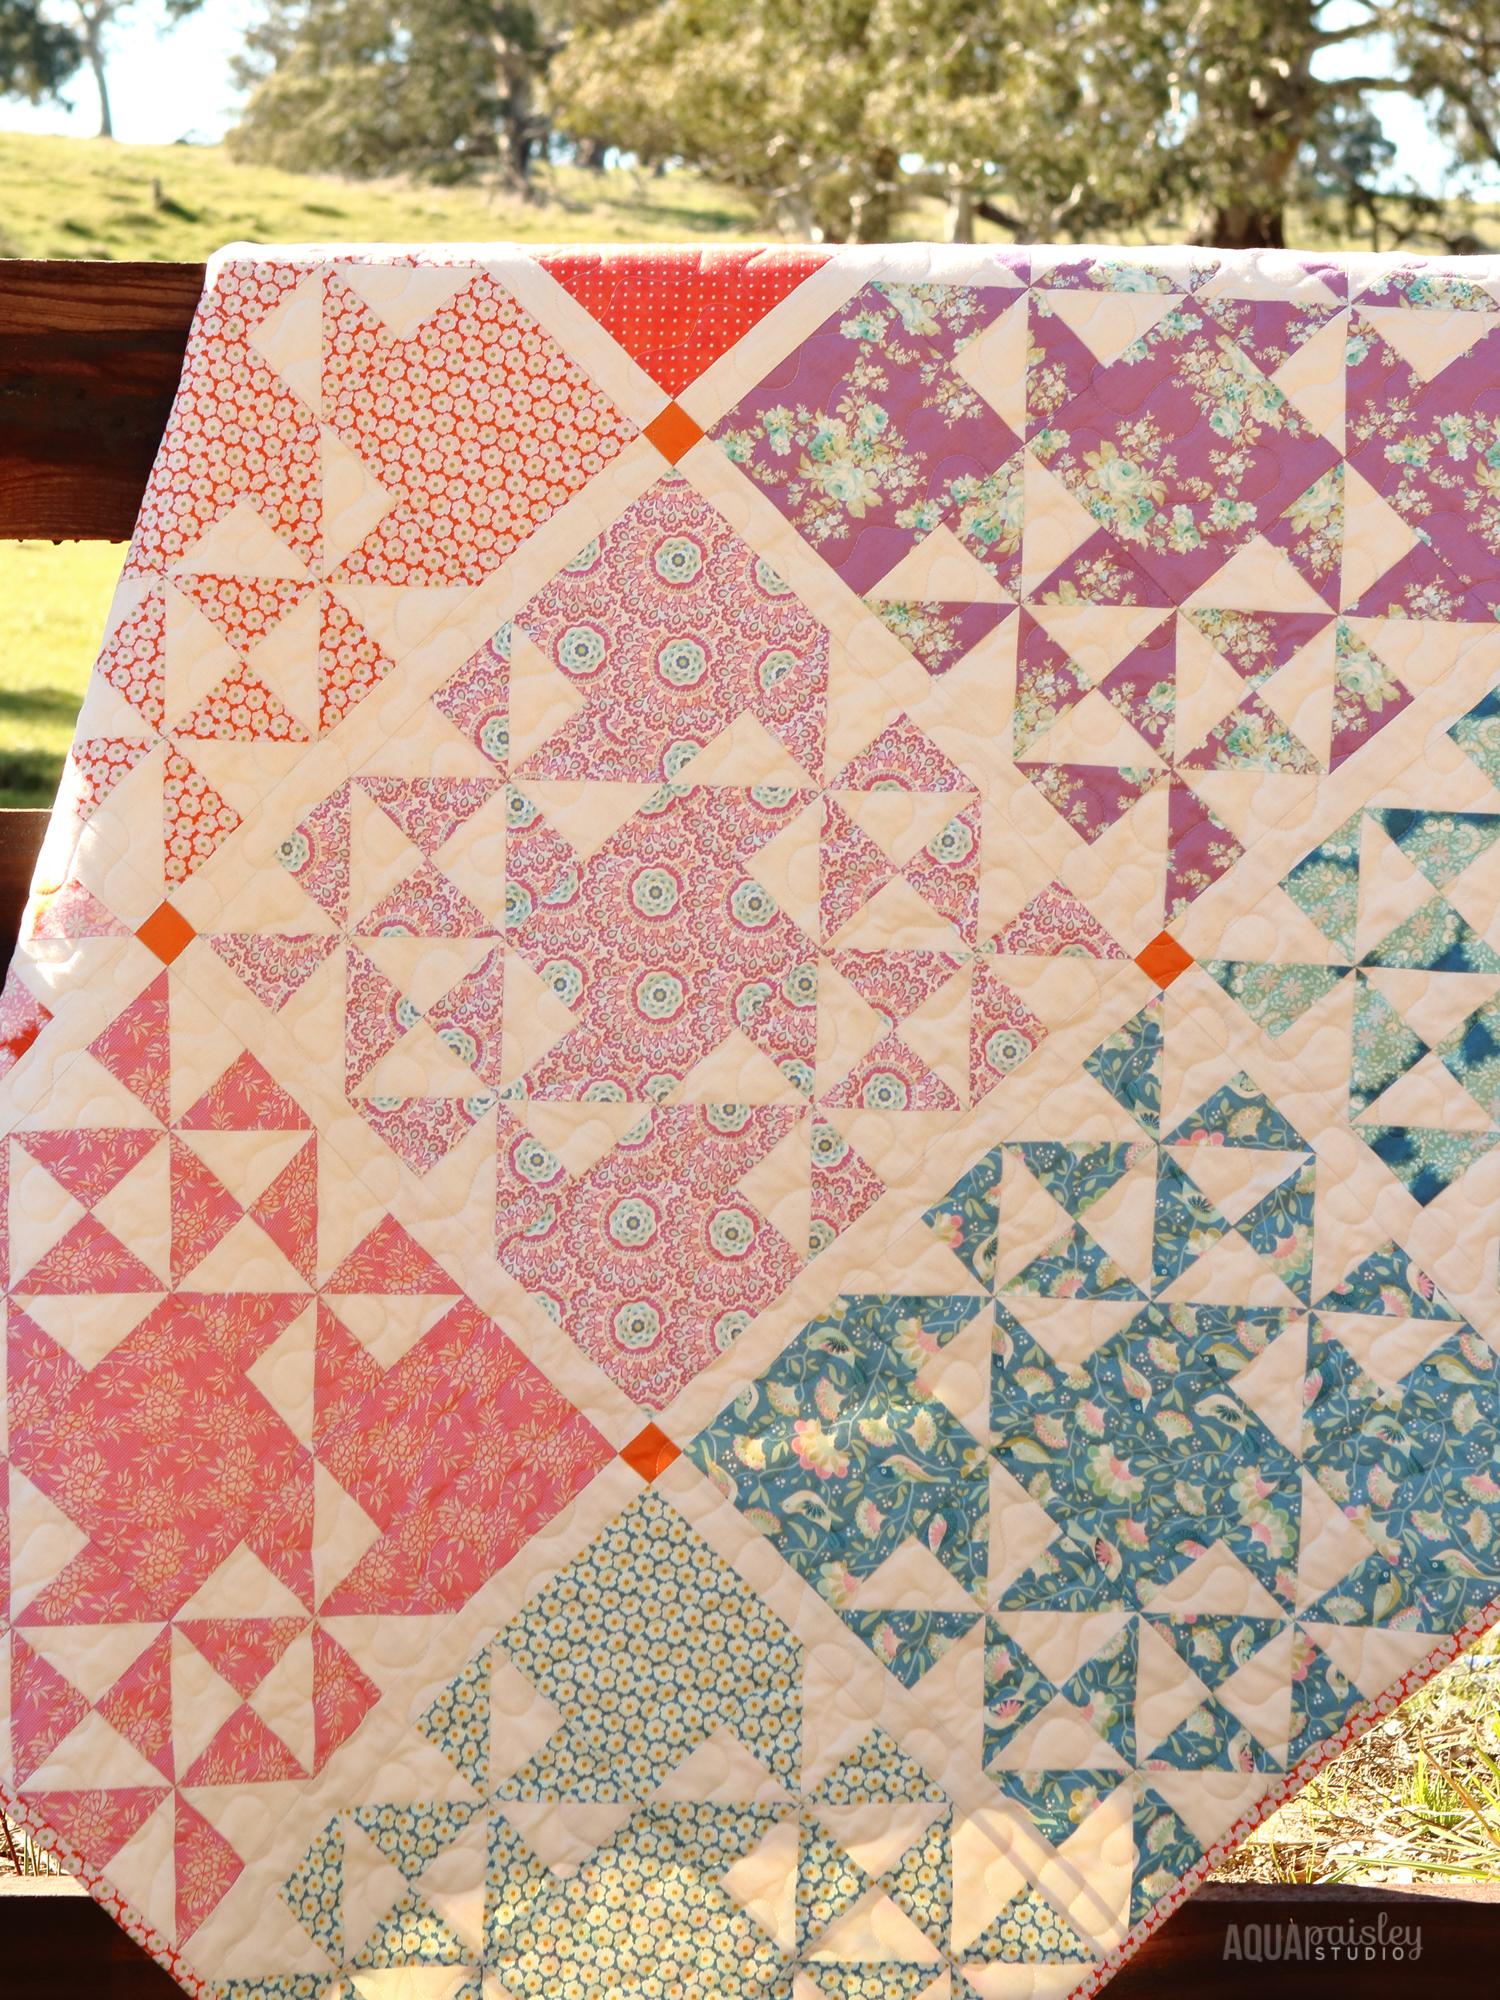 Aqua Paisley Studio: Harvest Market Quilt | Tilda Harvest Fabric